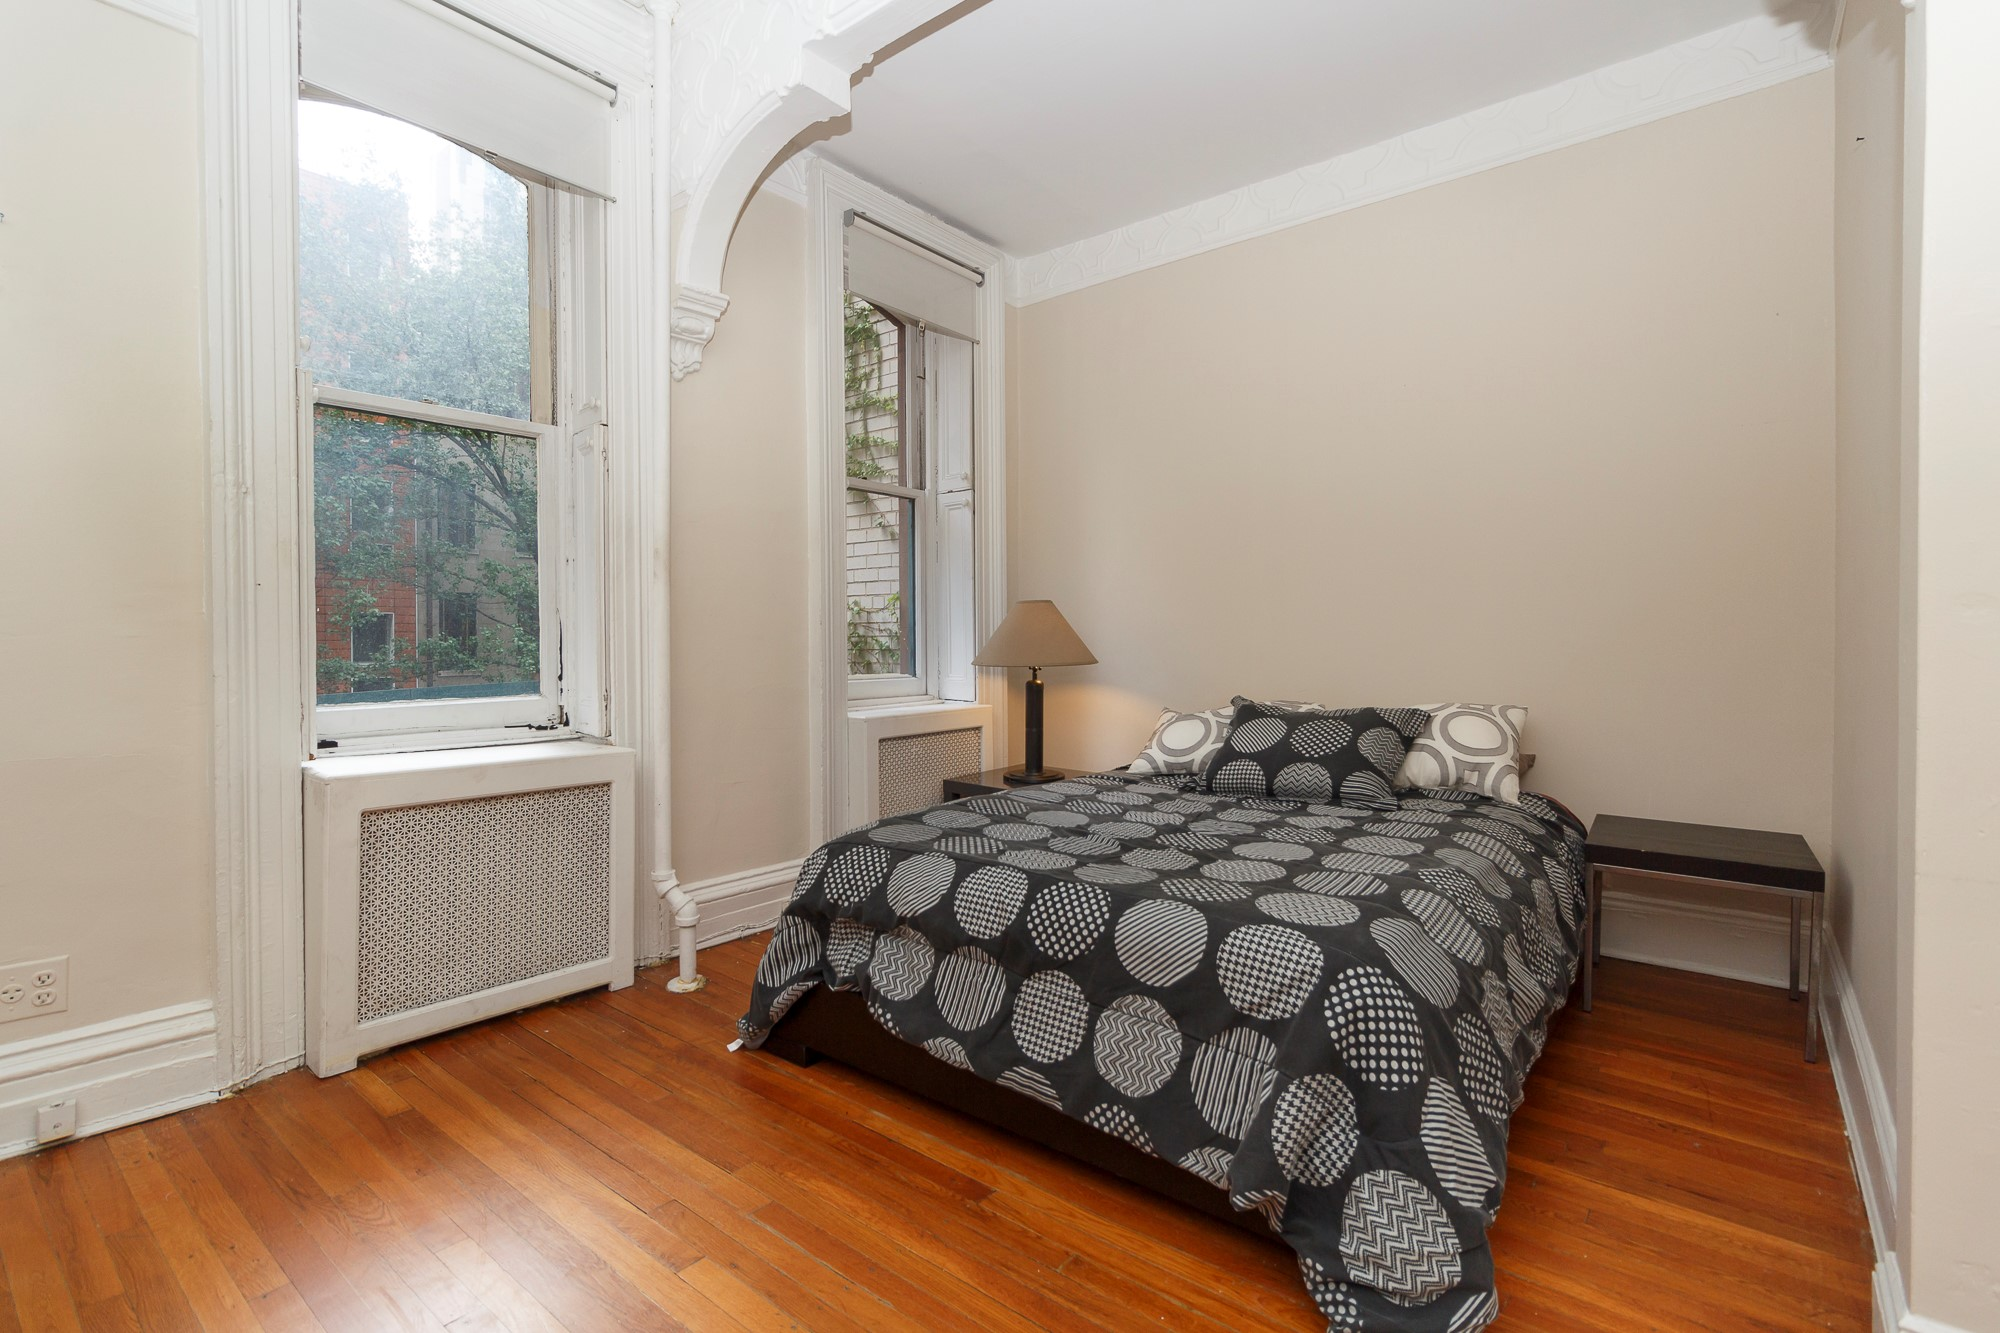 NY apartment photographer latest work: one bedroom ...